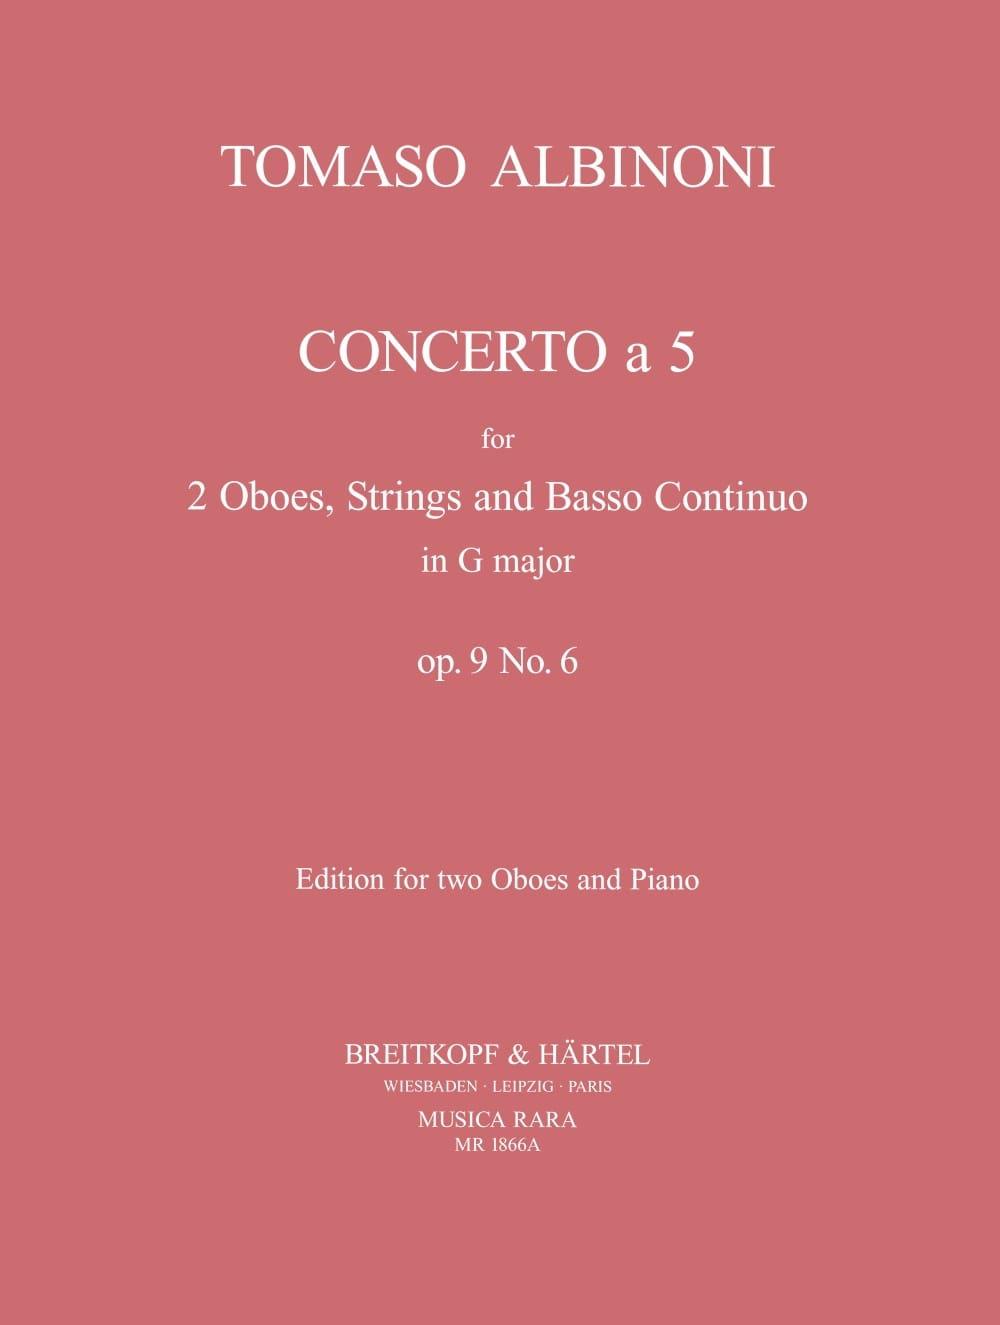 Concerto a 5 op. 9 n° 6 - 2 Oboes piano - ALBINONI - laflutedepan.com